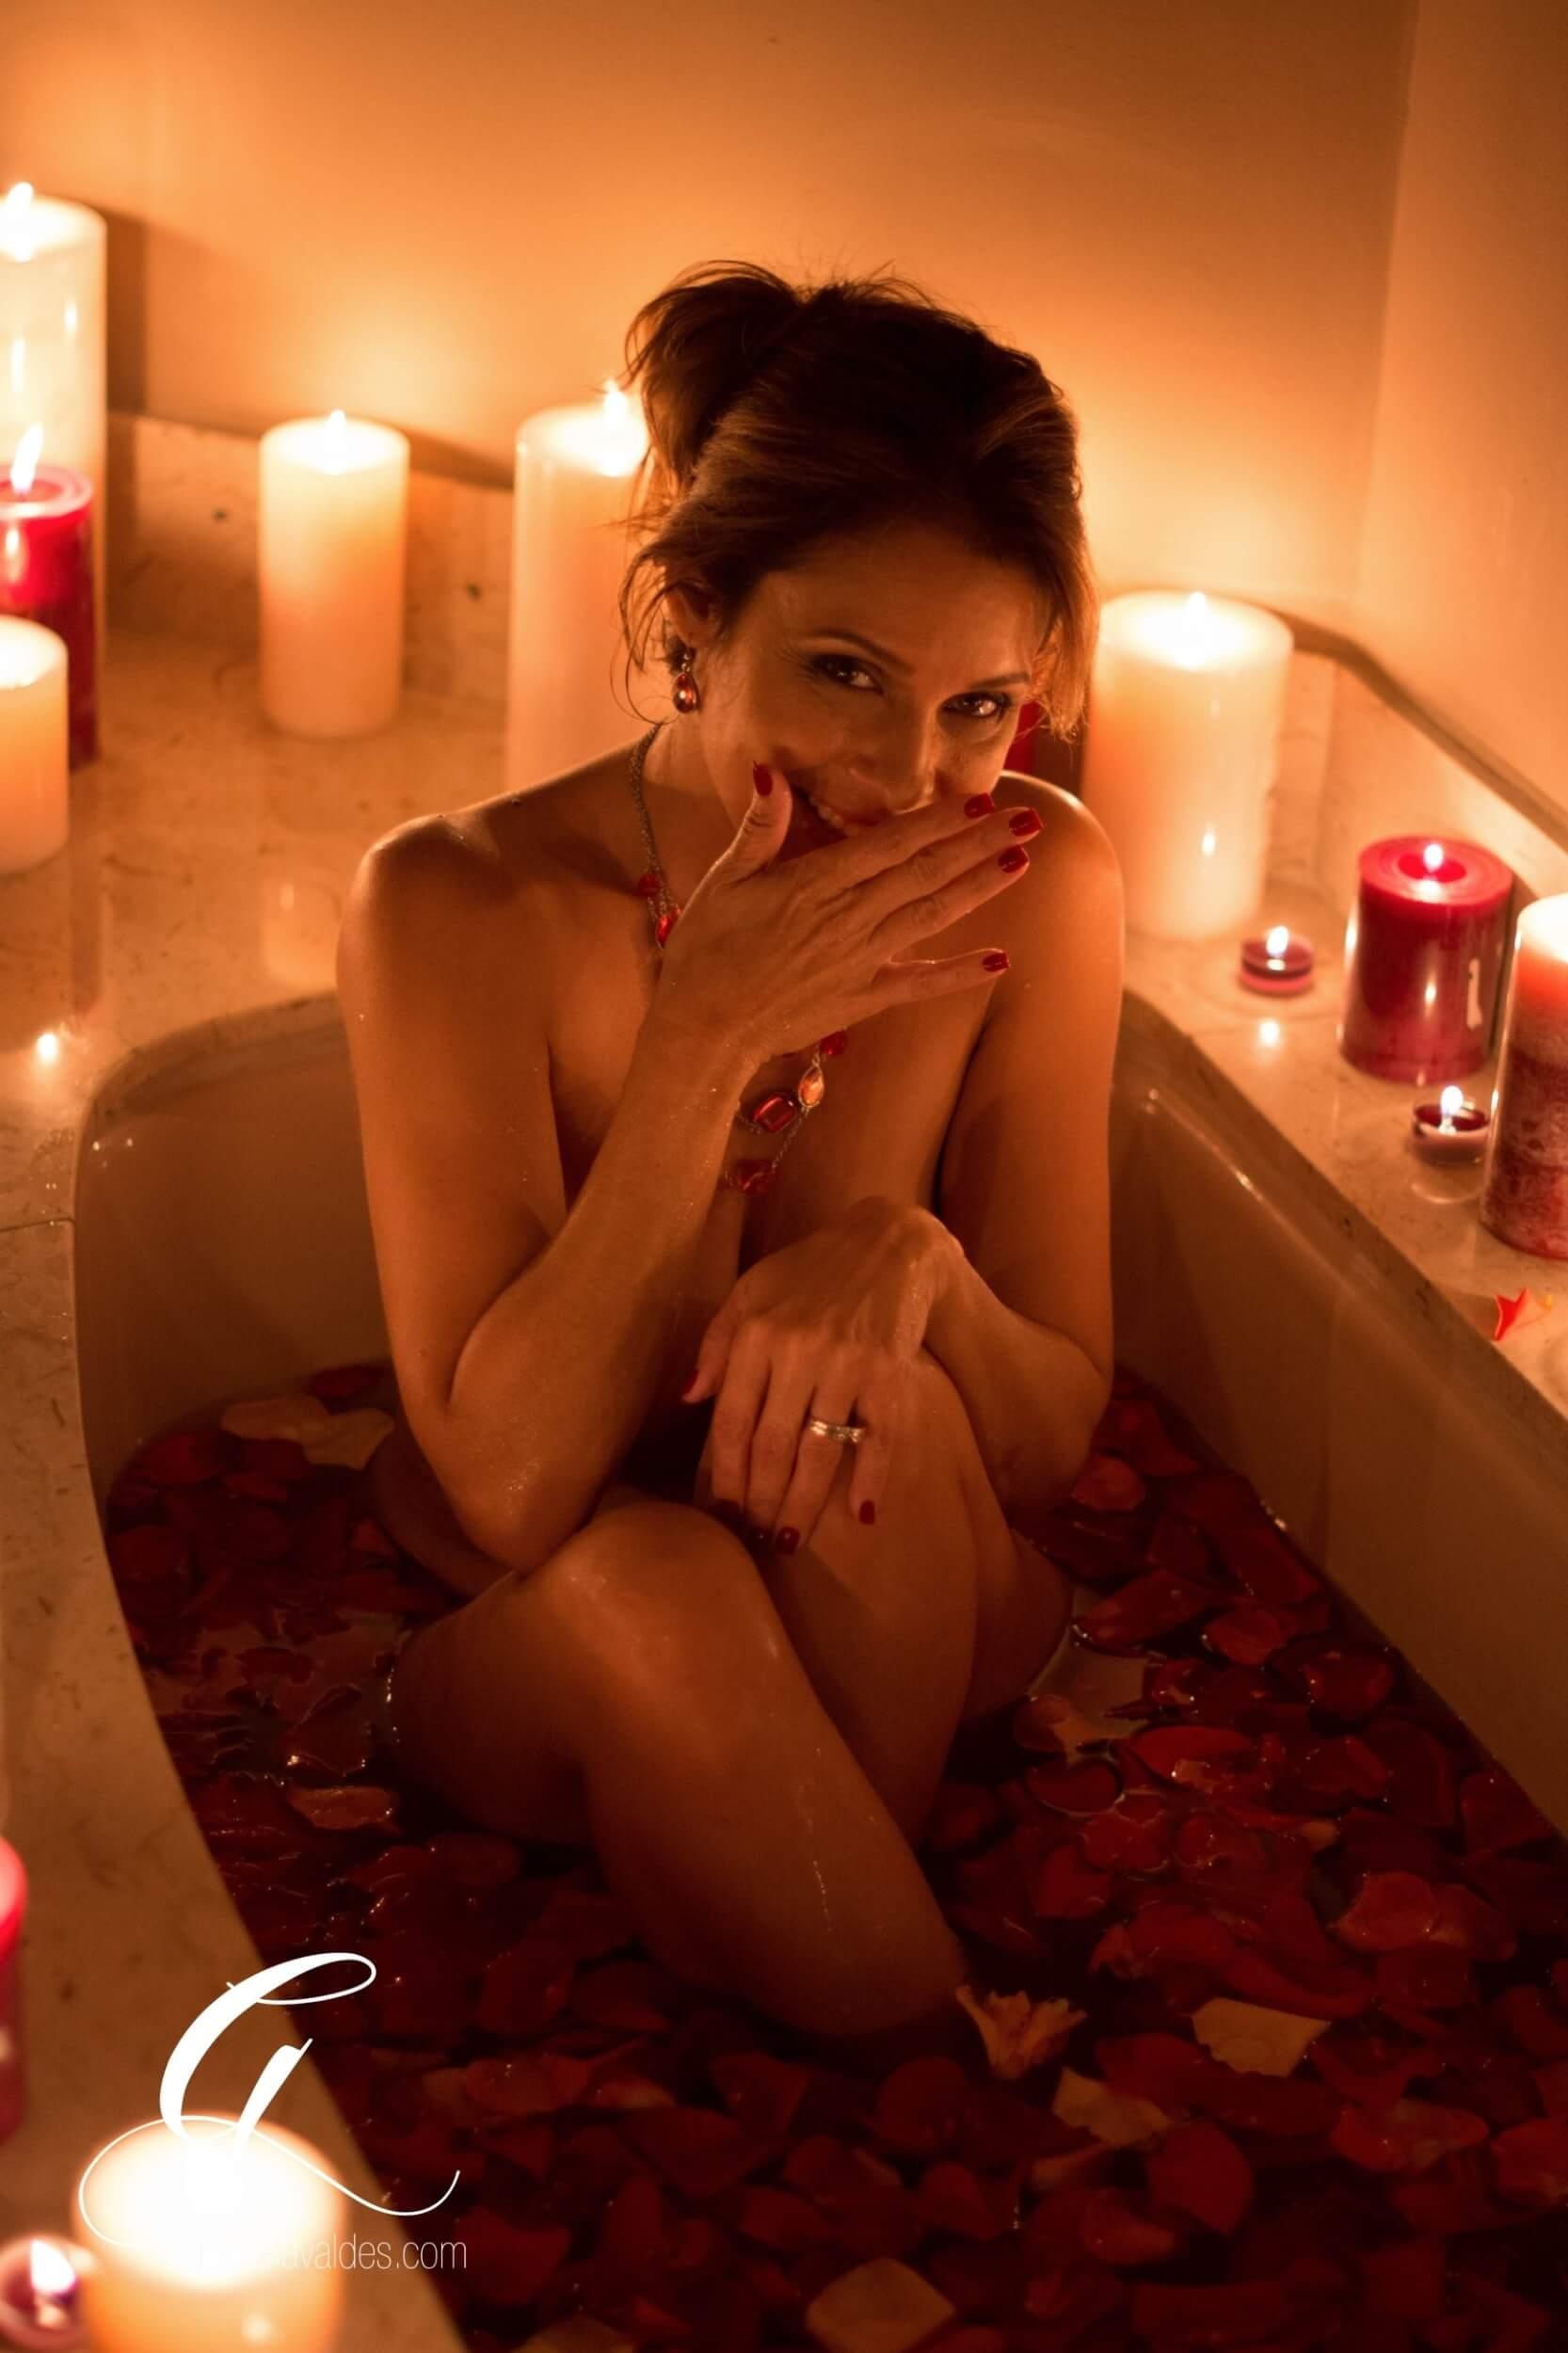 Bathtub Boudoir by Graciela Valdes.jpg